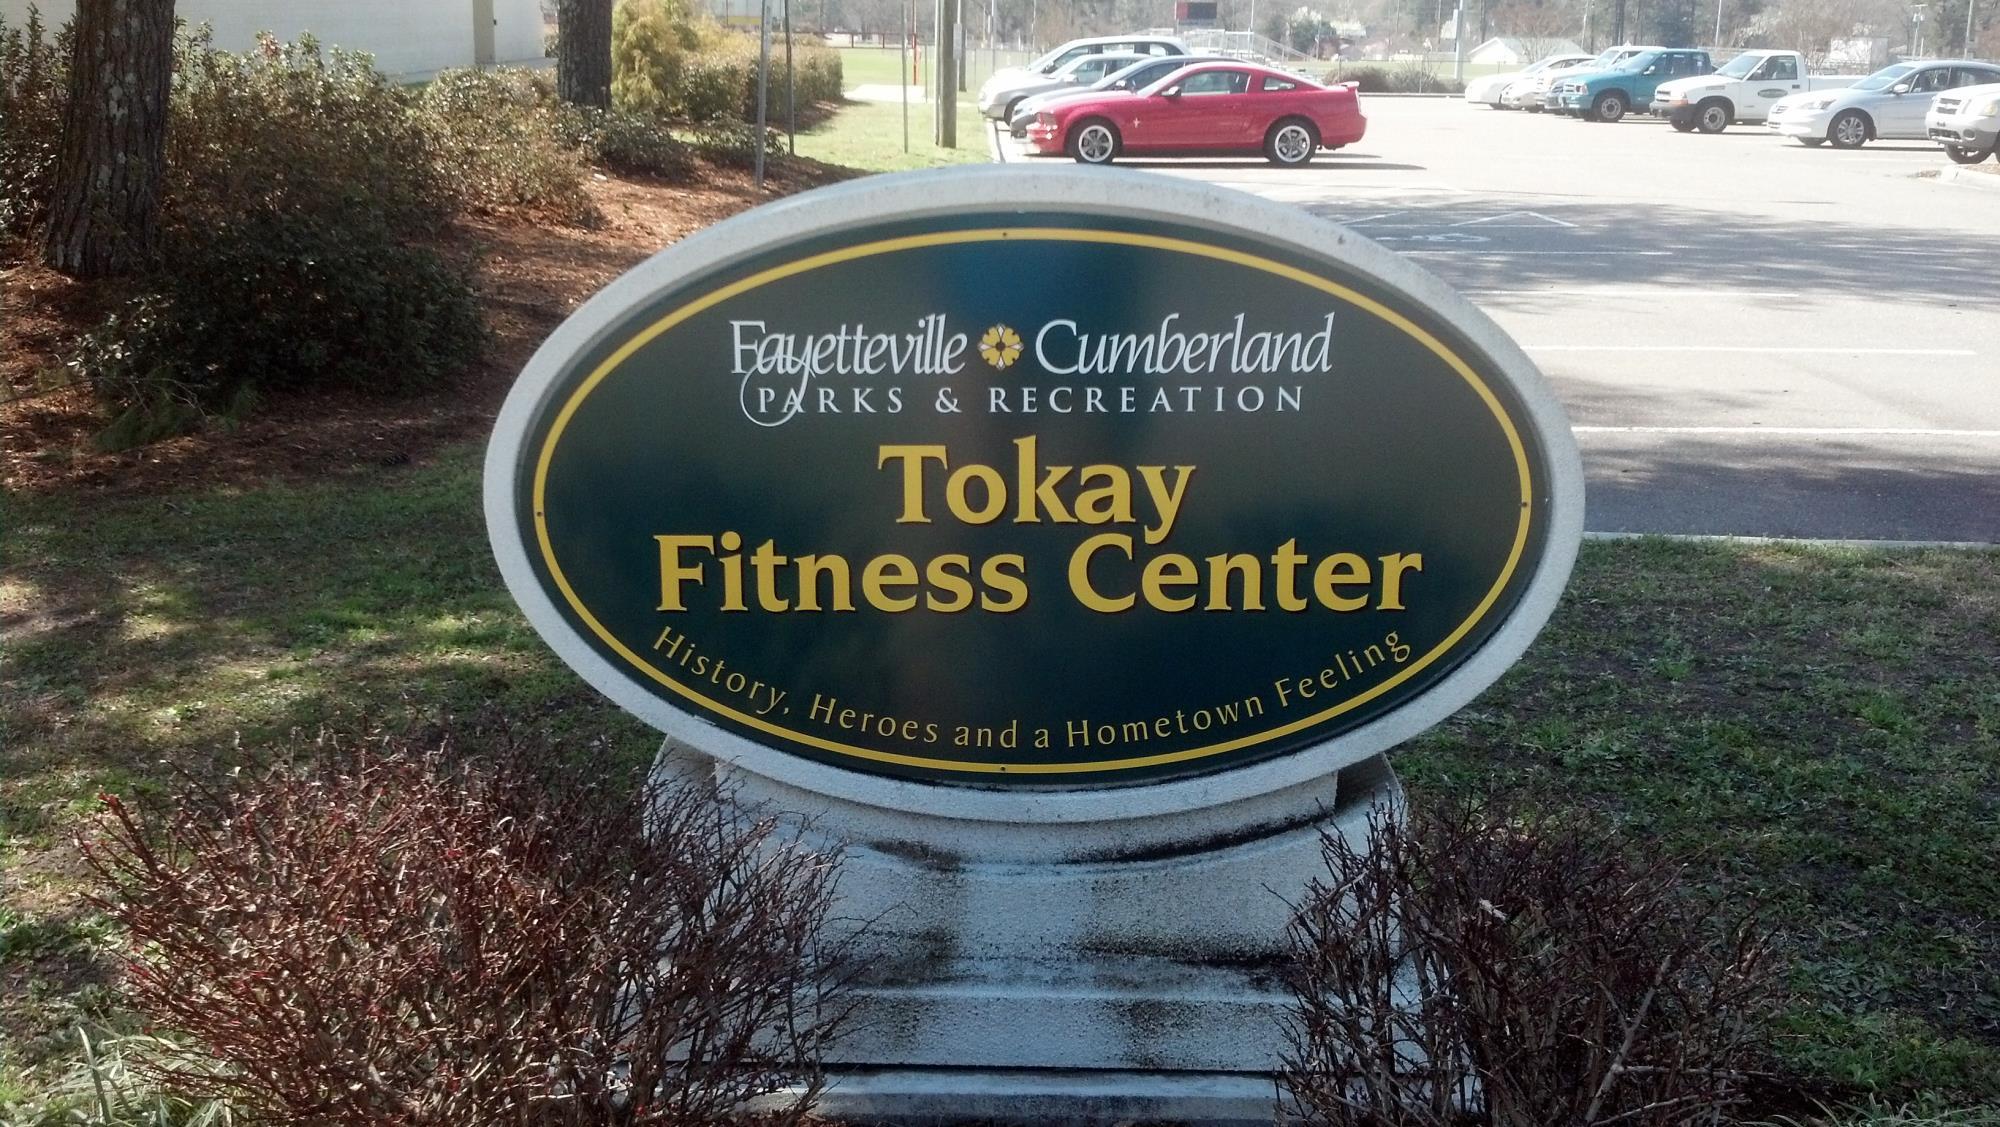 Tokay Senior Fitness Center   Parks and Recreation